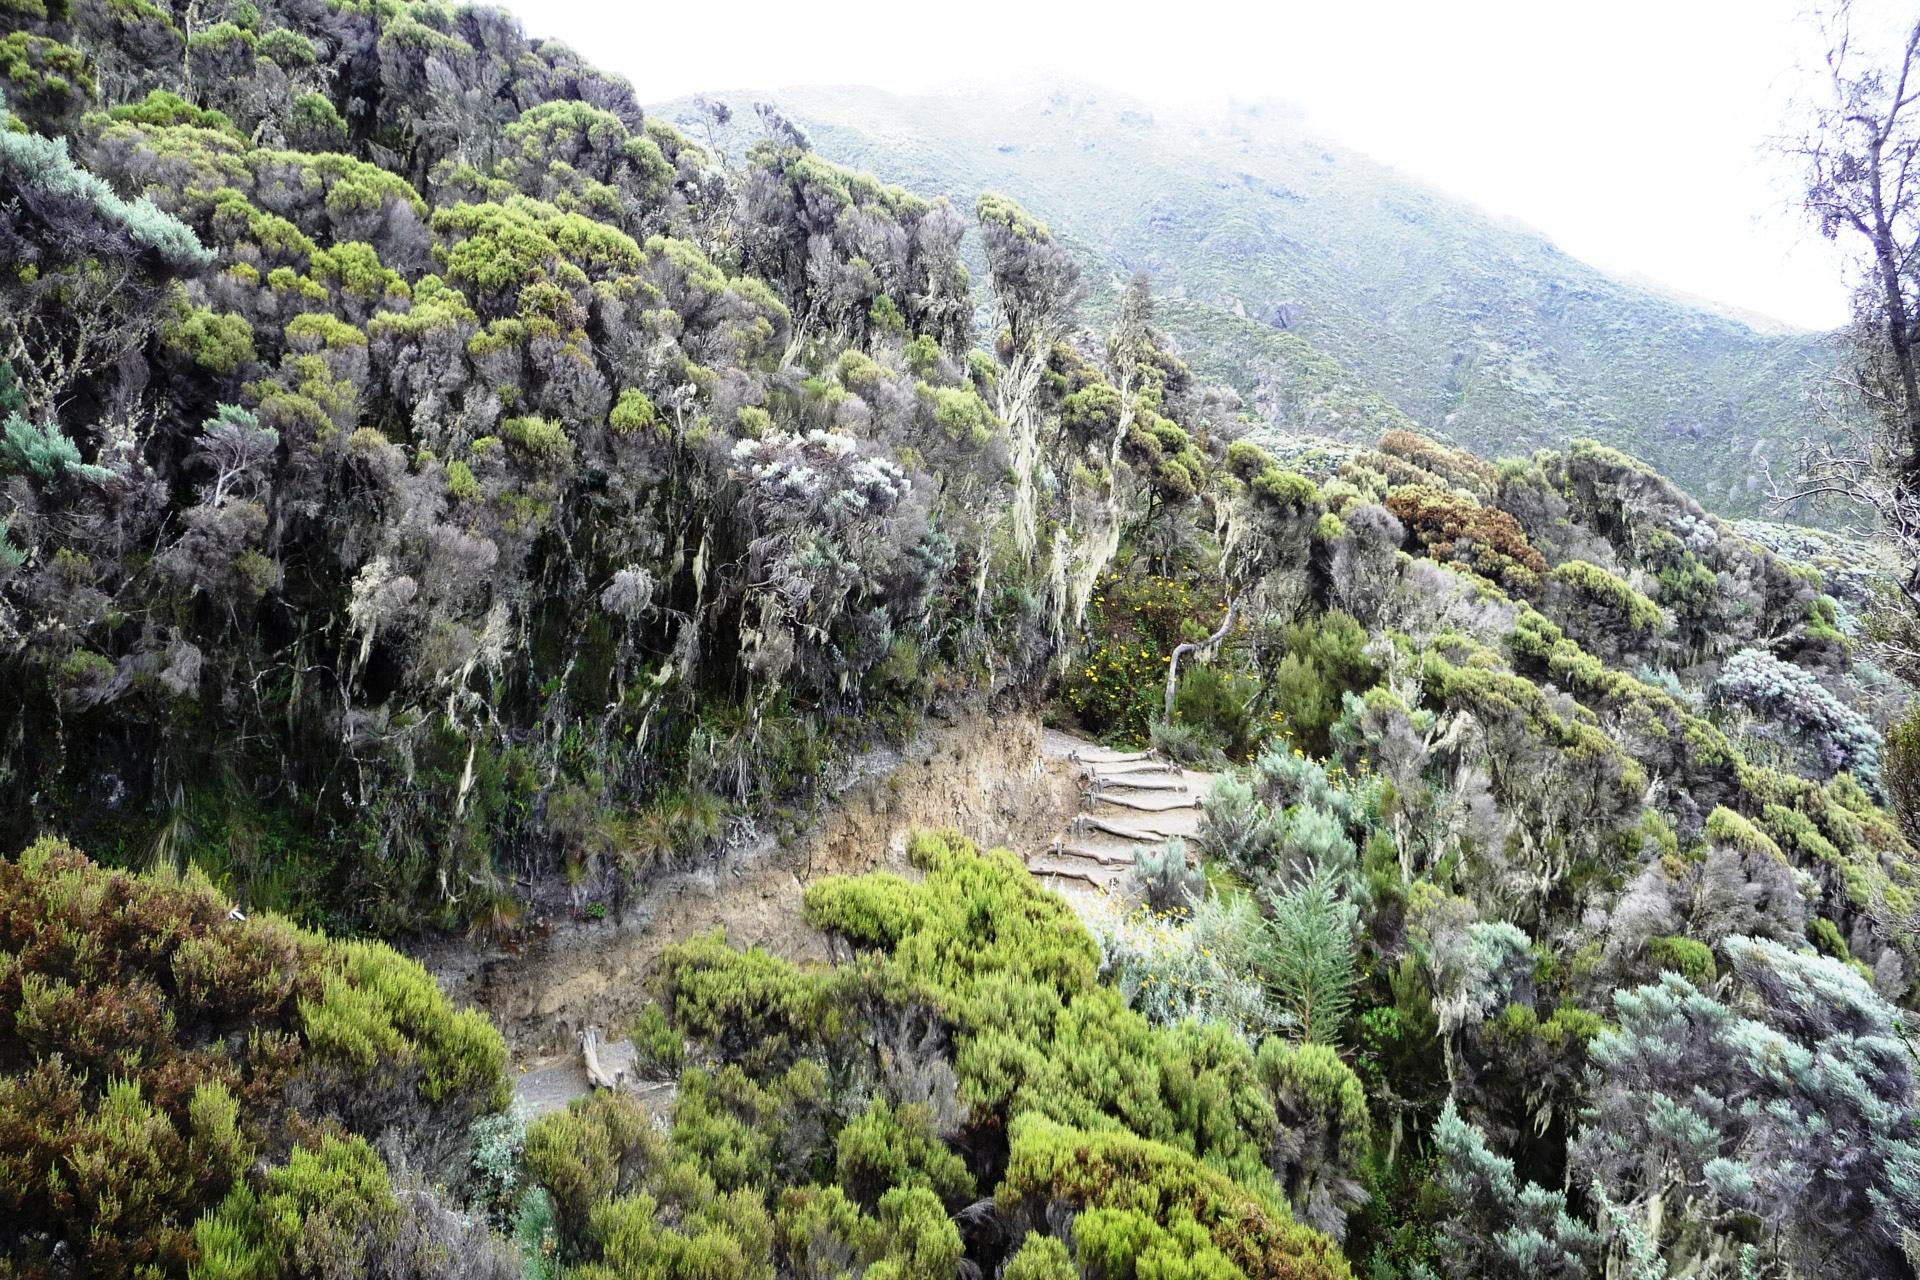 Mount-Meru-Arusha-Nationalpark-Tansania-Globetrotter-Select-Boehm-55